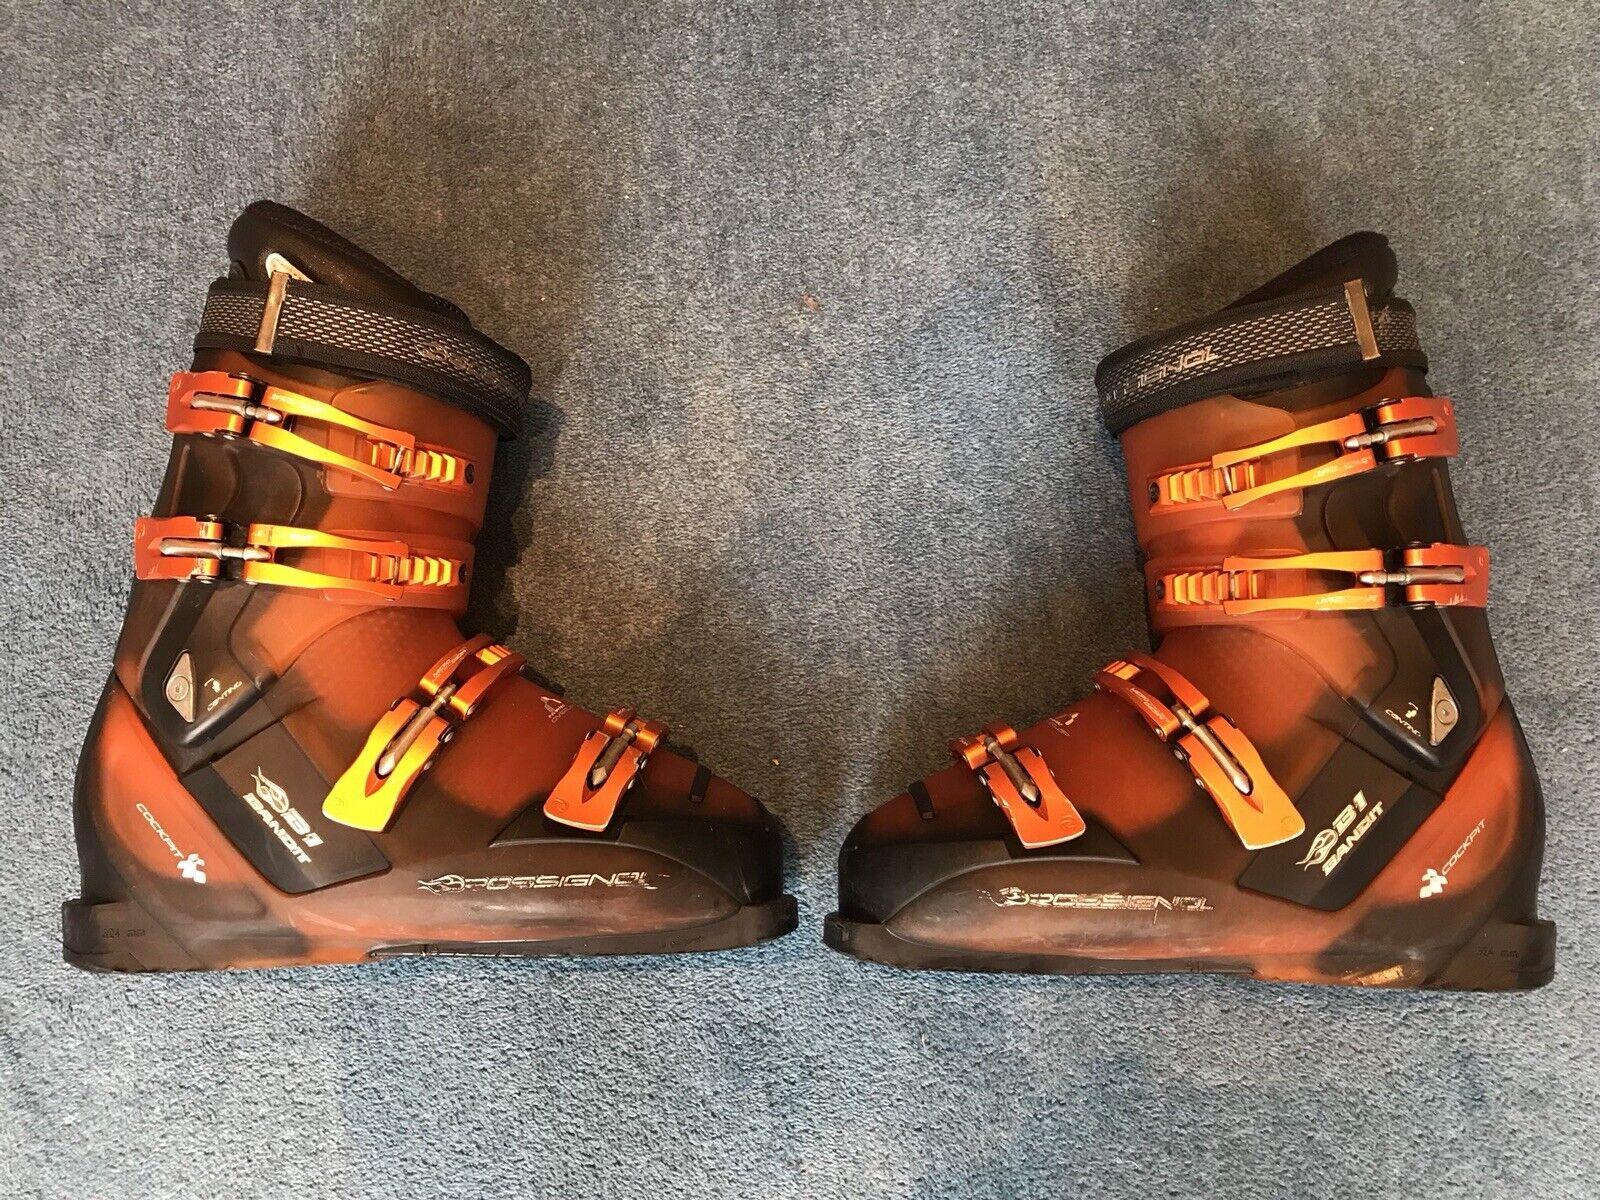 Rossignol Bandit Ski Boots UK Size 9   43